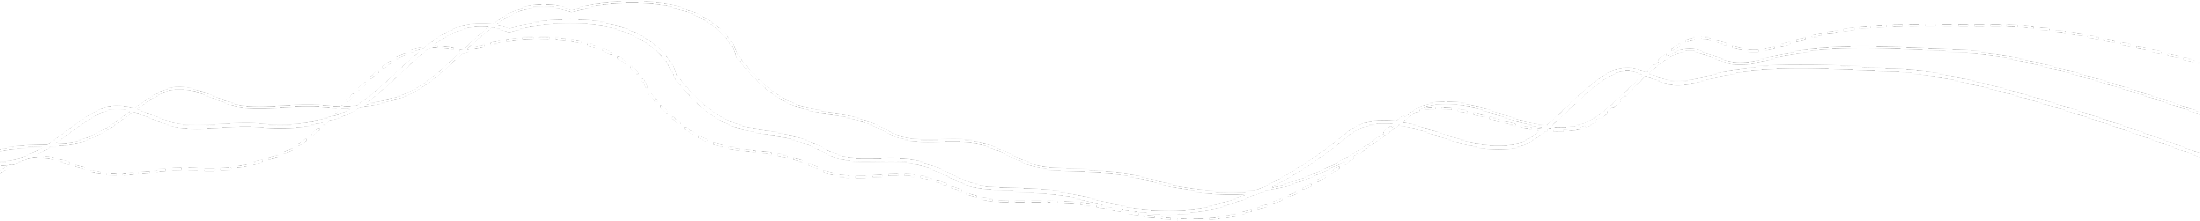 lines-regional-prosperity-strategy